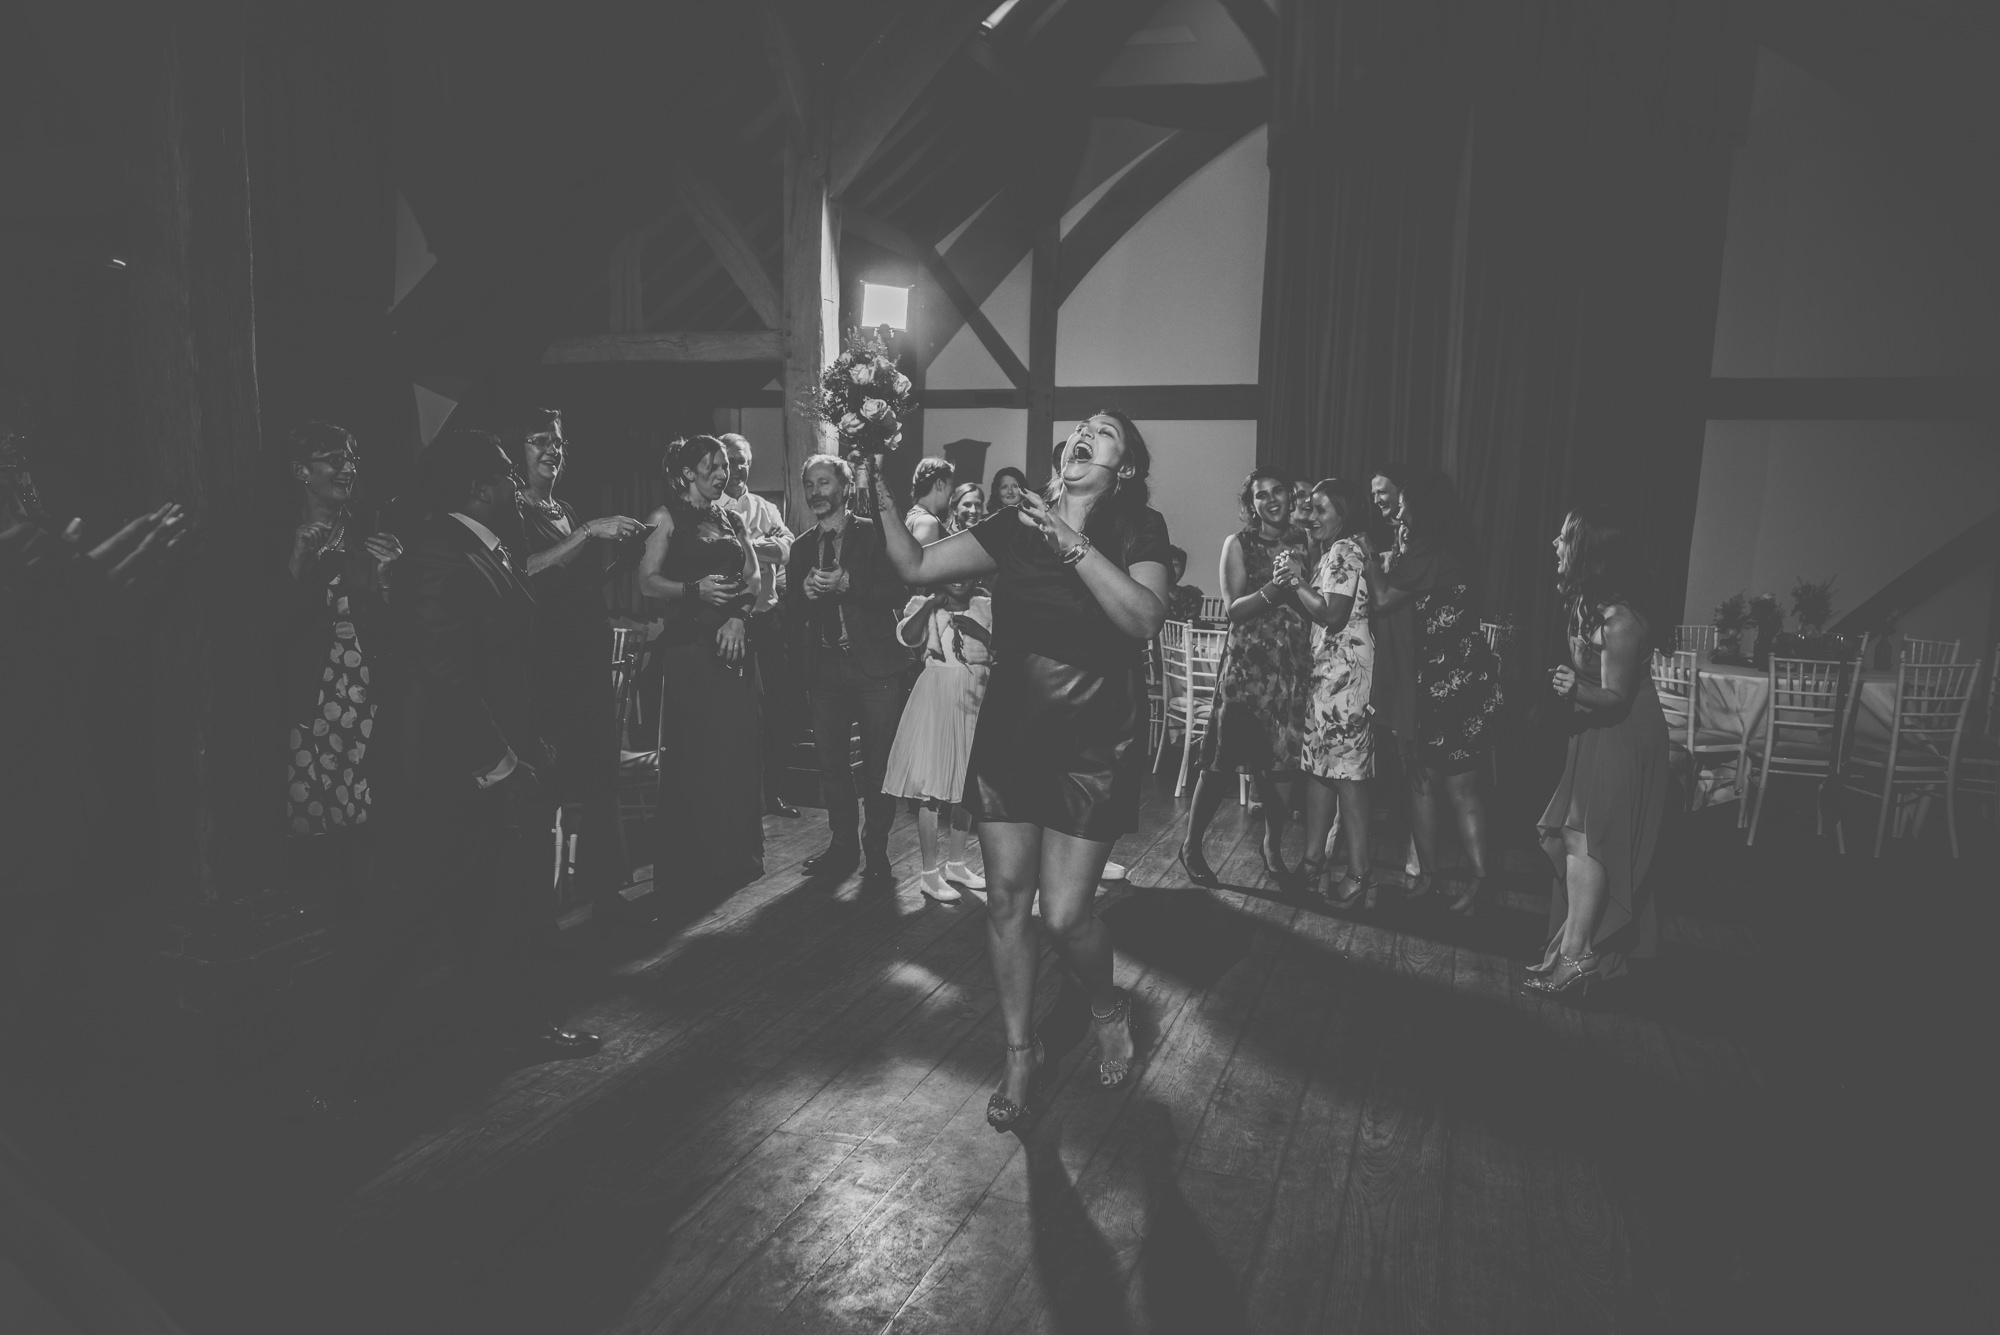 Charisse-and-James-wedding-in-Cain-Manor-Venue-Hampshire-Manu-Mendoza-Wedding-Photography-550.jpg